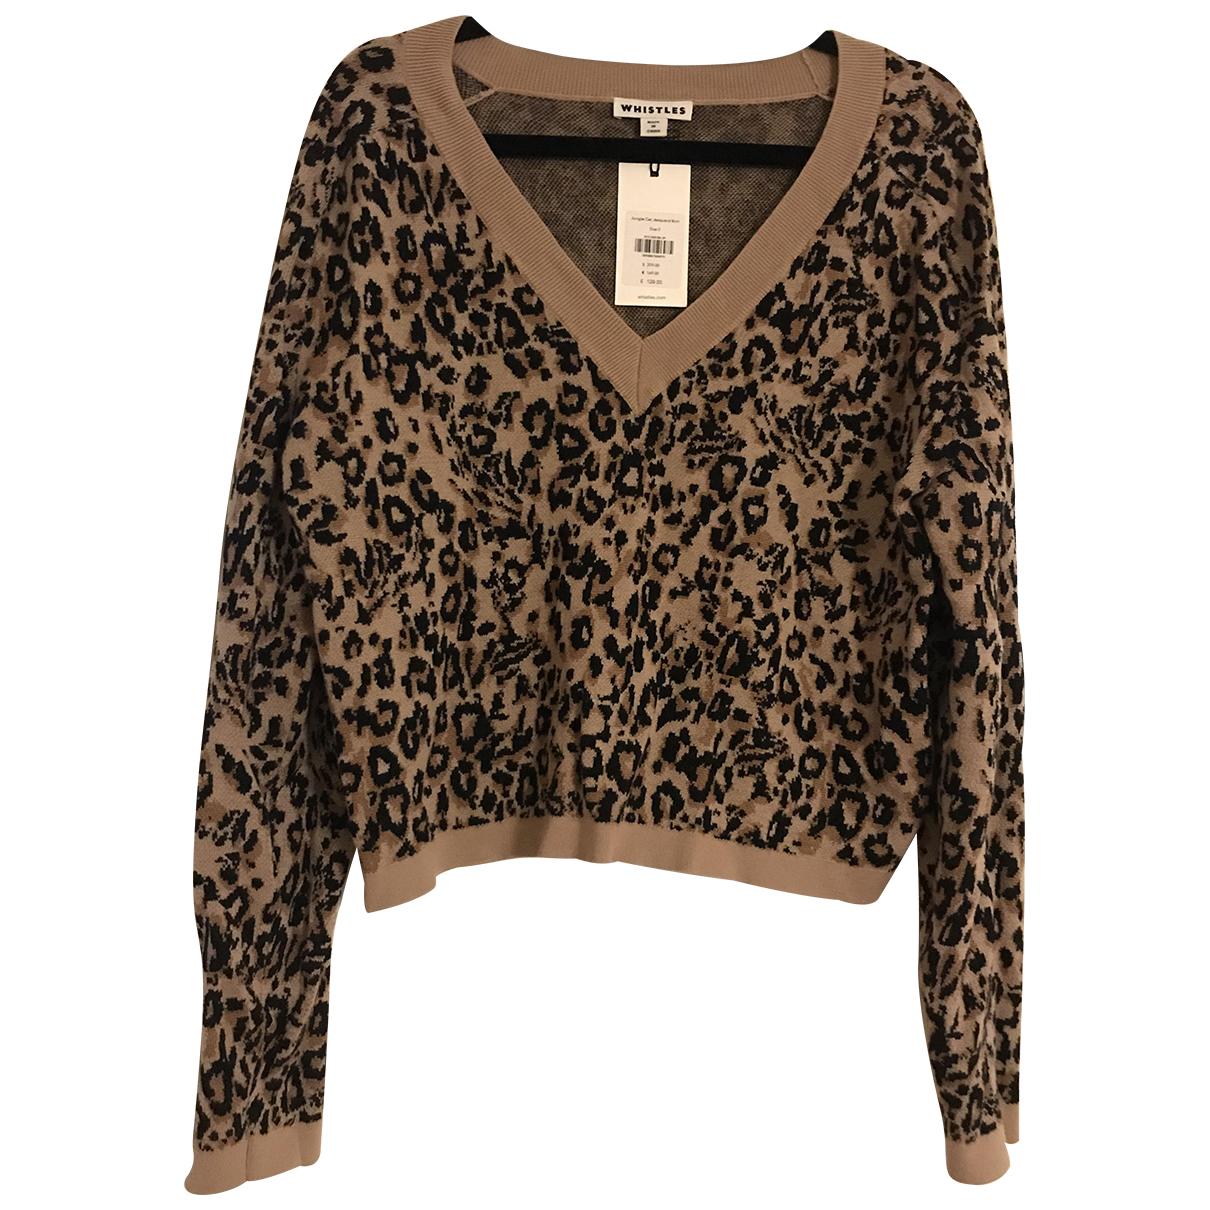 Whistles - Pull   pour femme en laine - marron